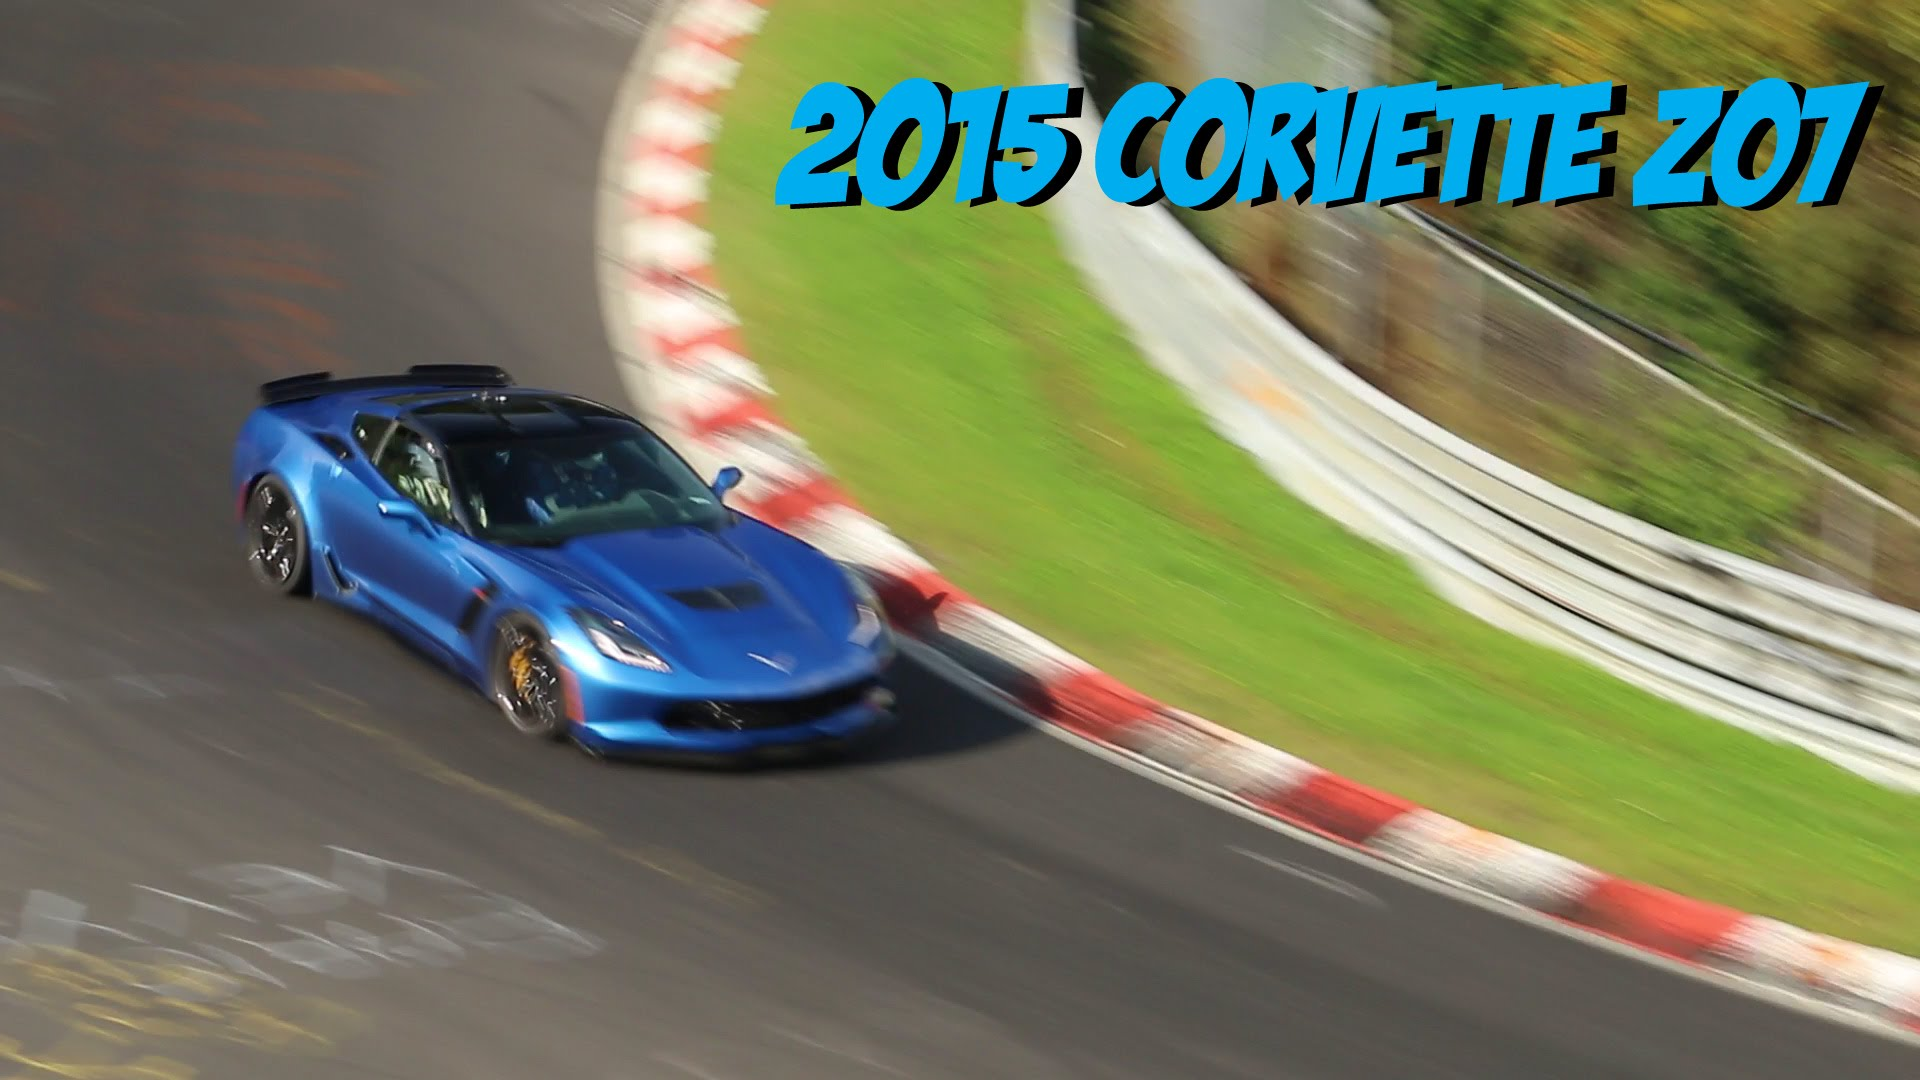 2015-corvette-z07-with-paddleshi